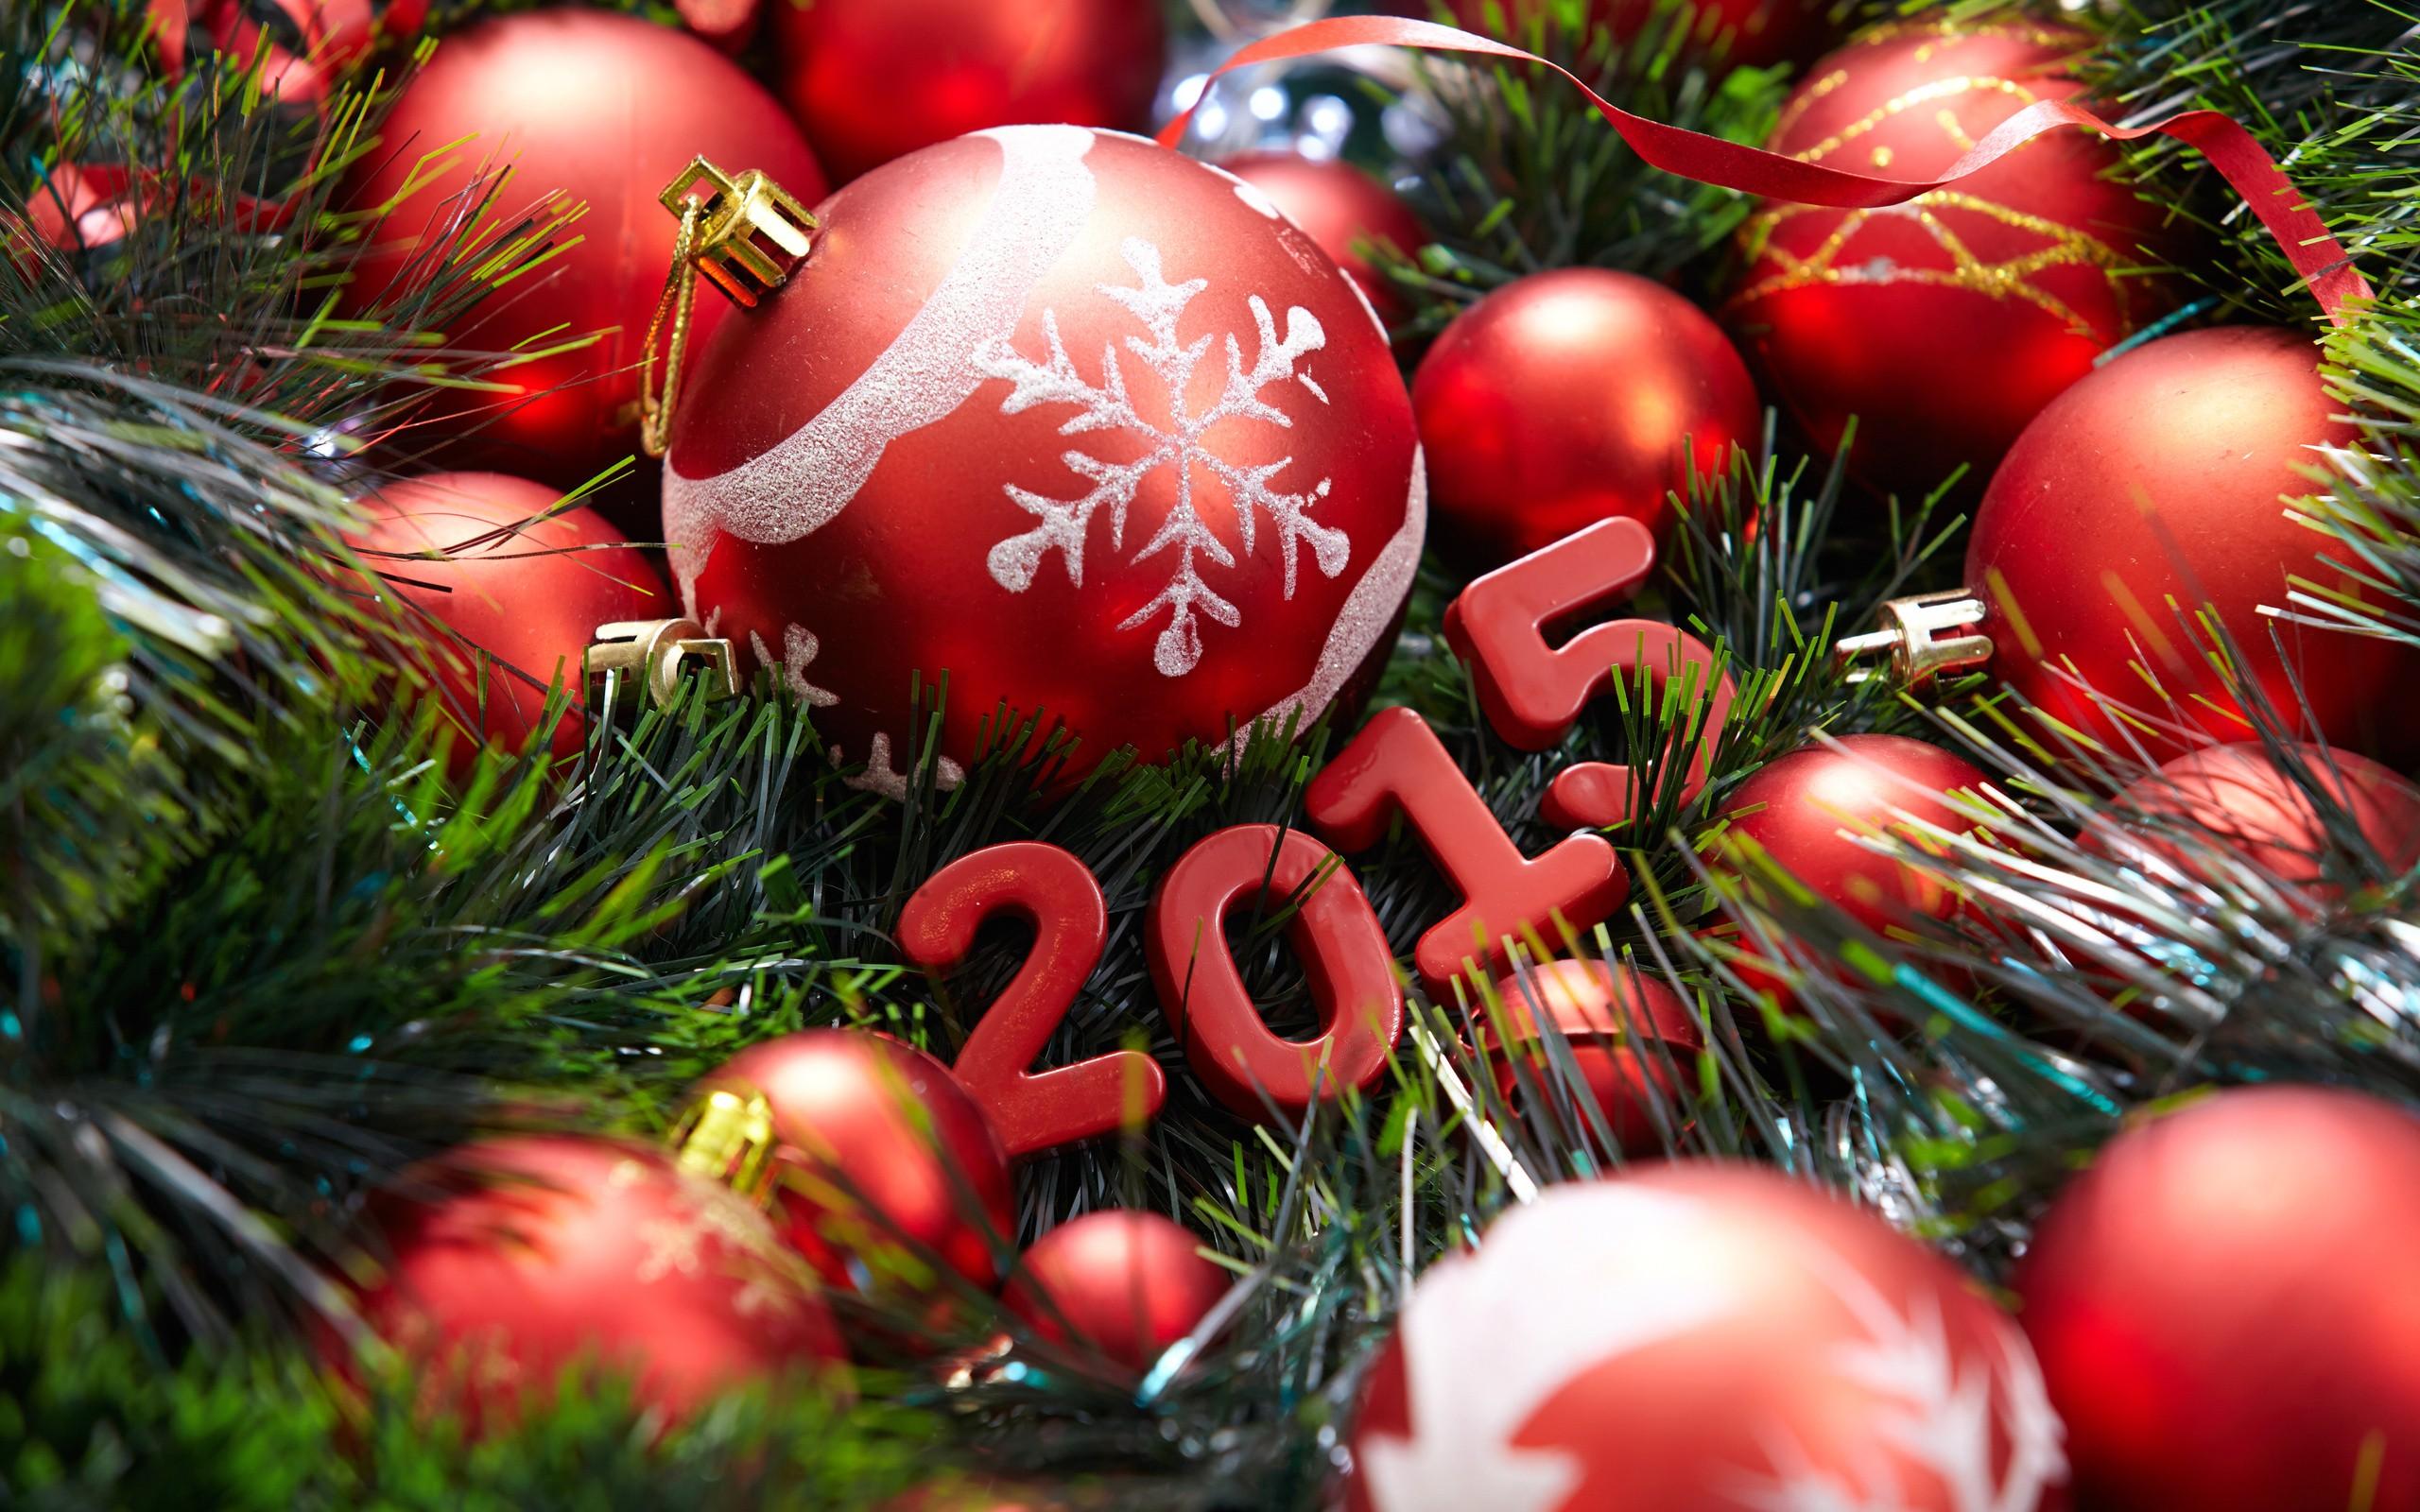 Фото на новый год 2015 год